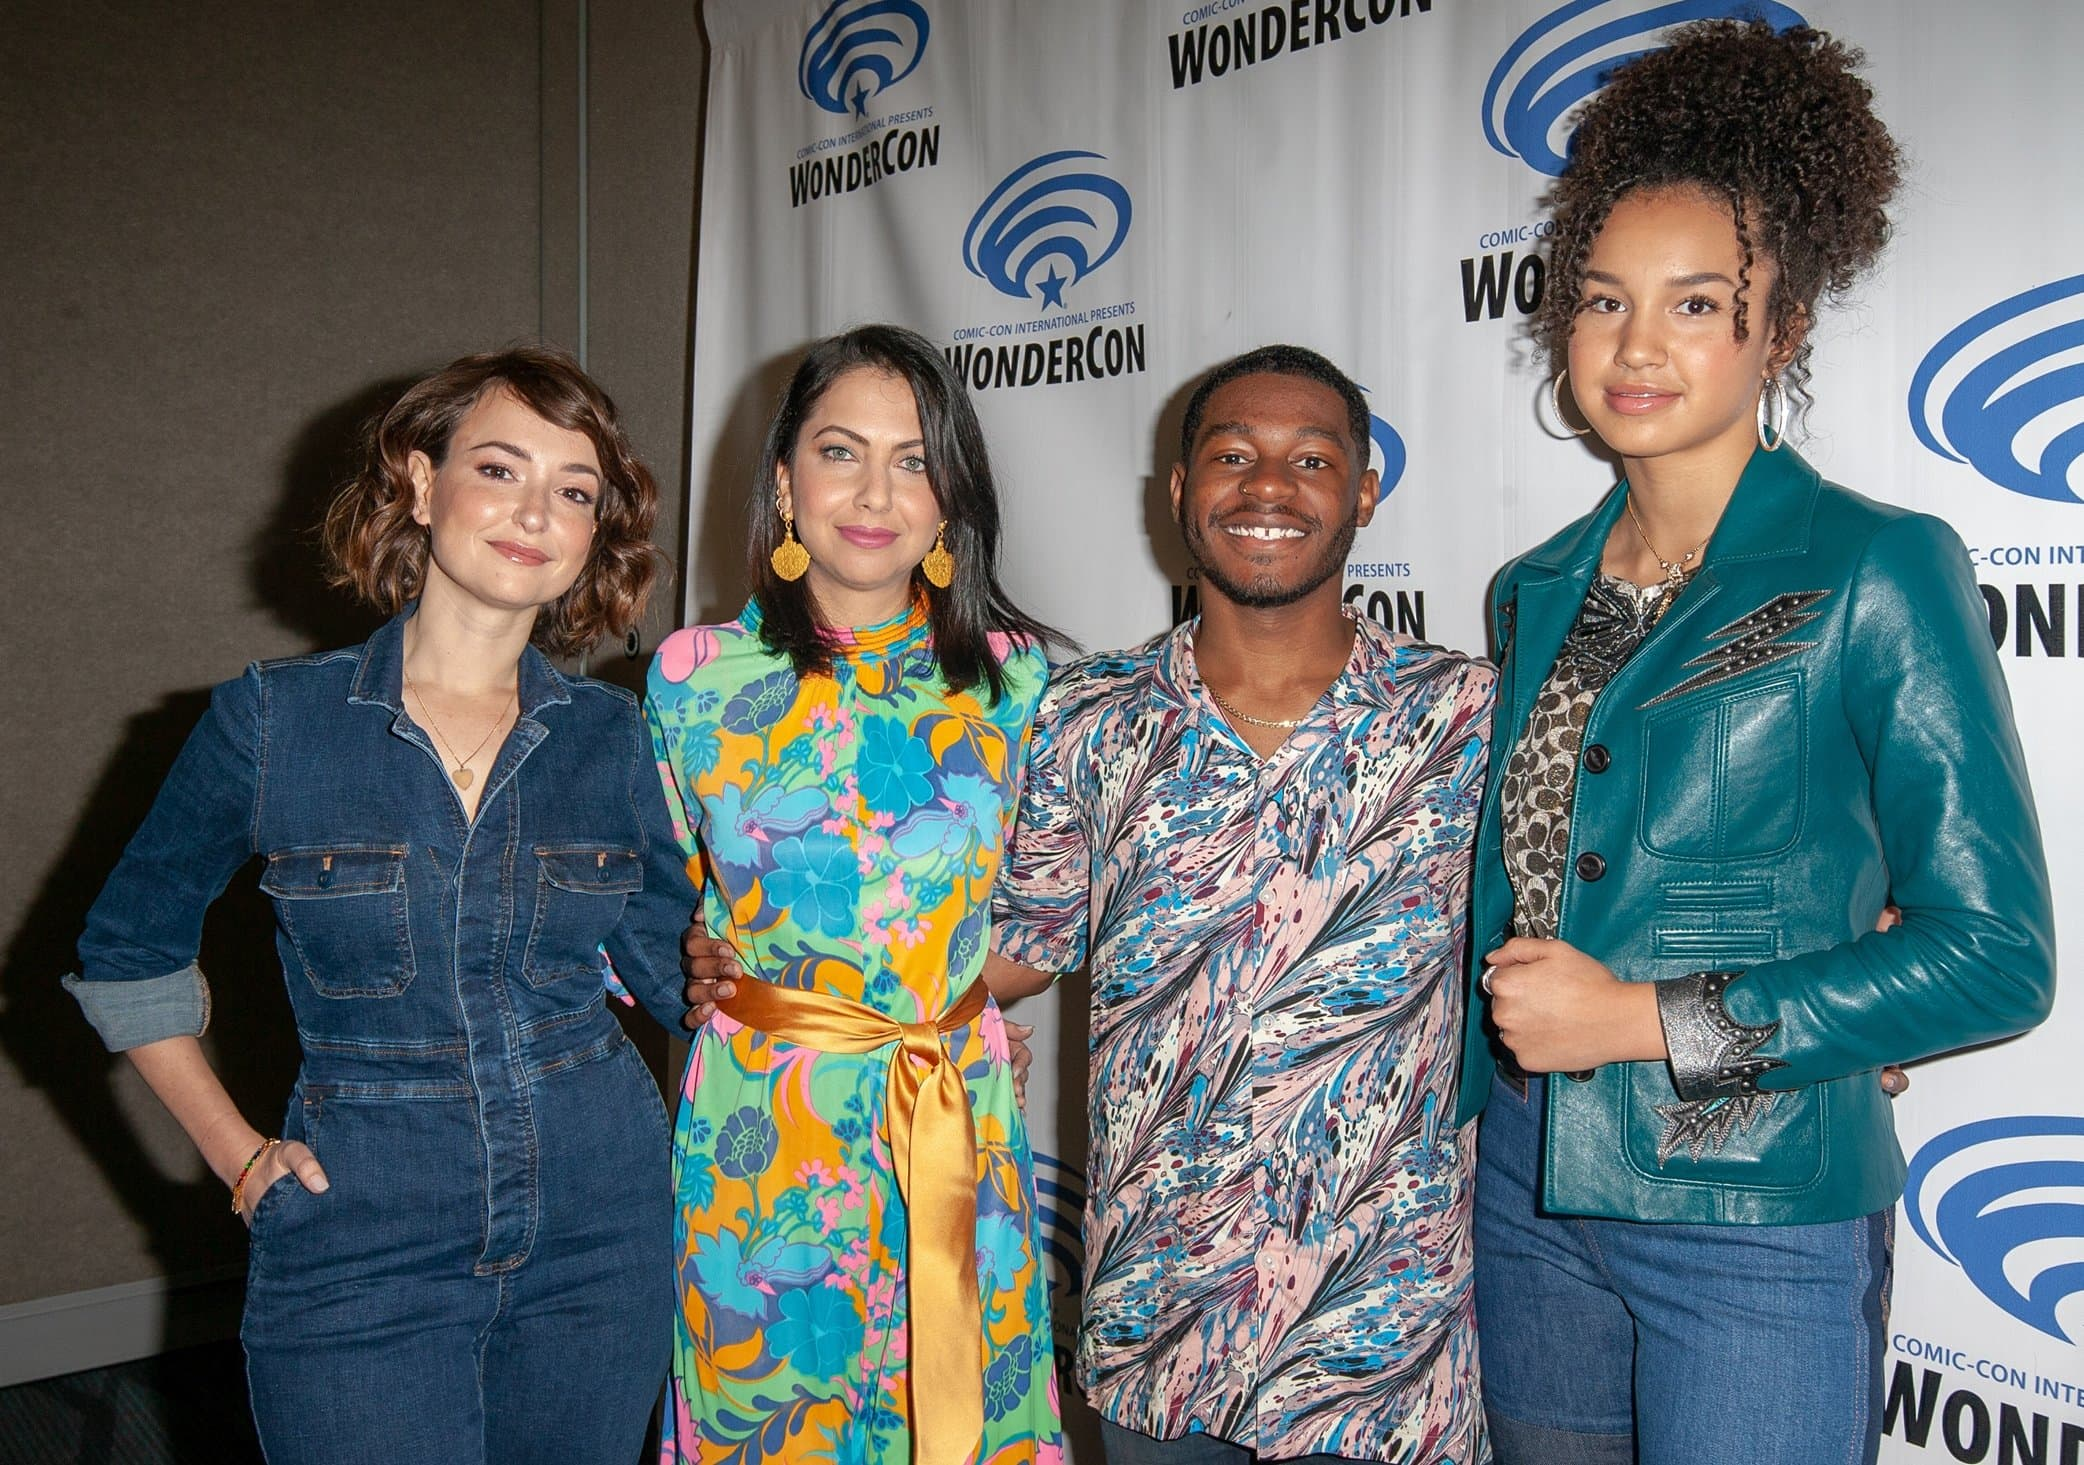 Marvel Rising co-stars Kamil McFadden (Patriot), Milana Vayntrub (Squirrel Girl), and Kathreen Khavari (Ms. Marvel) at the premiere of Marvel Rising: Heart of Iron